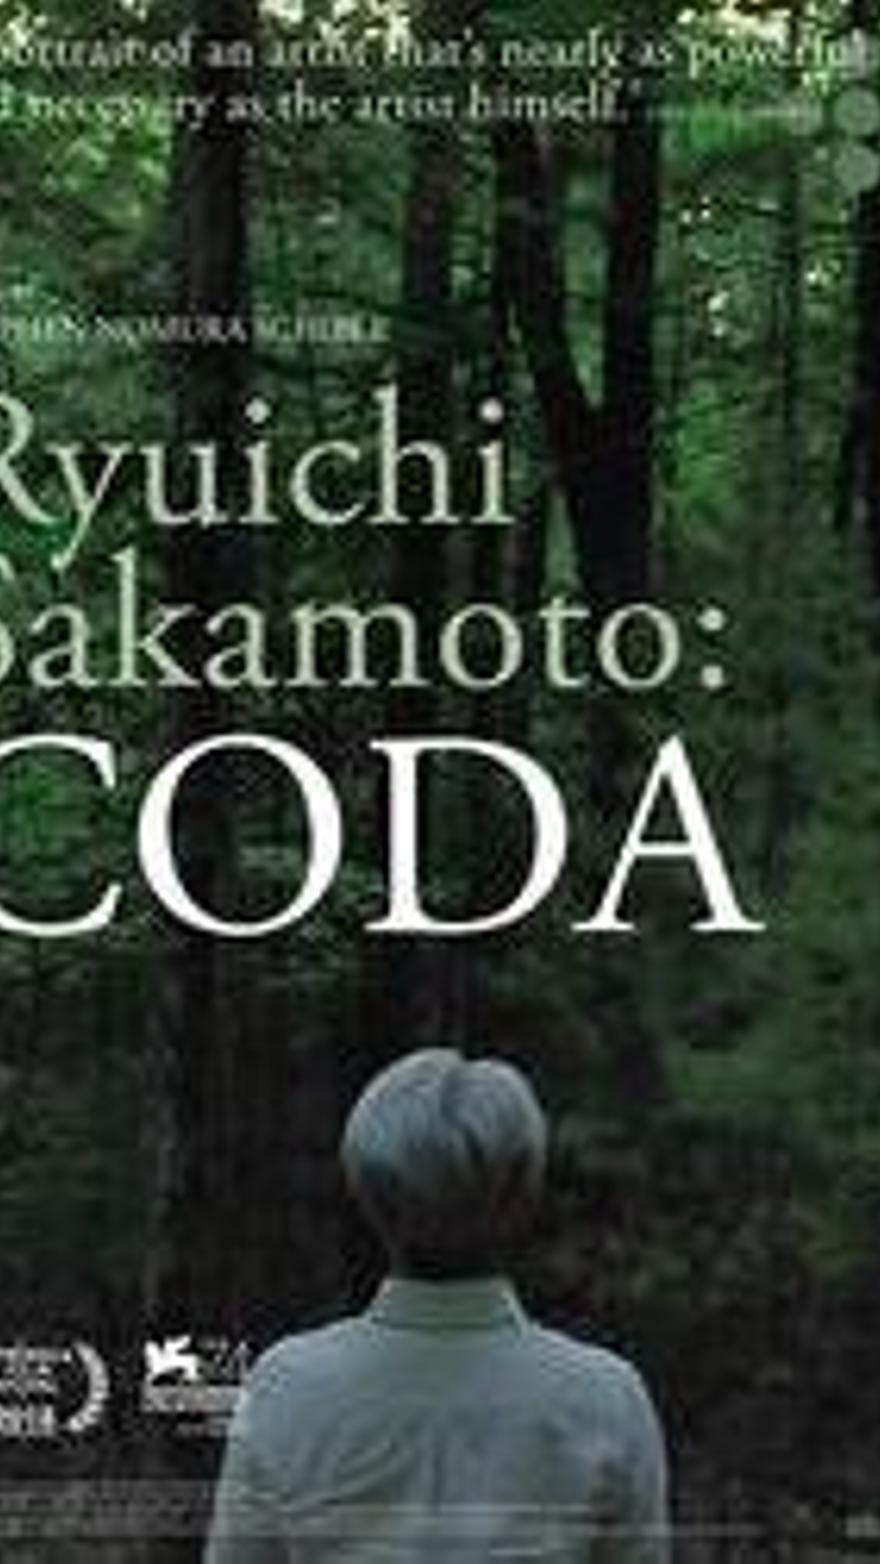 La música de Ryuichi Sakamoto